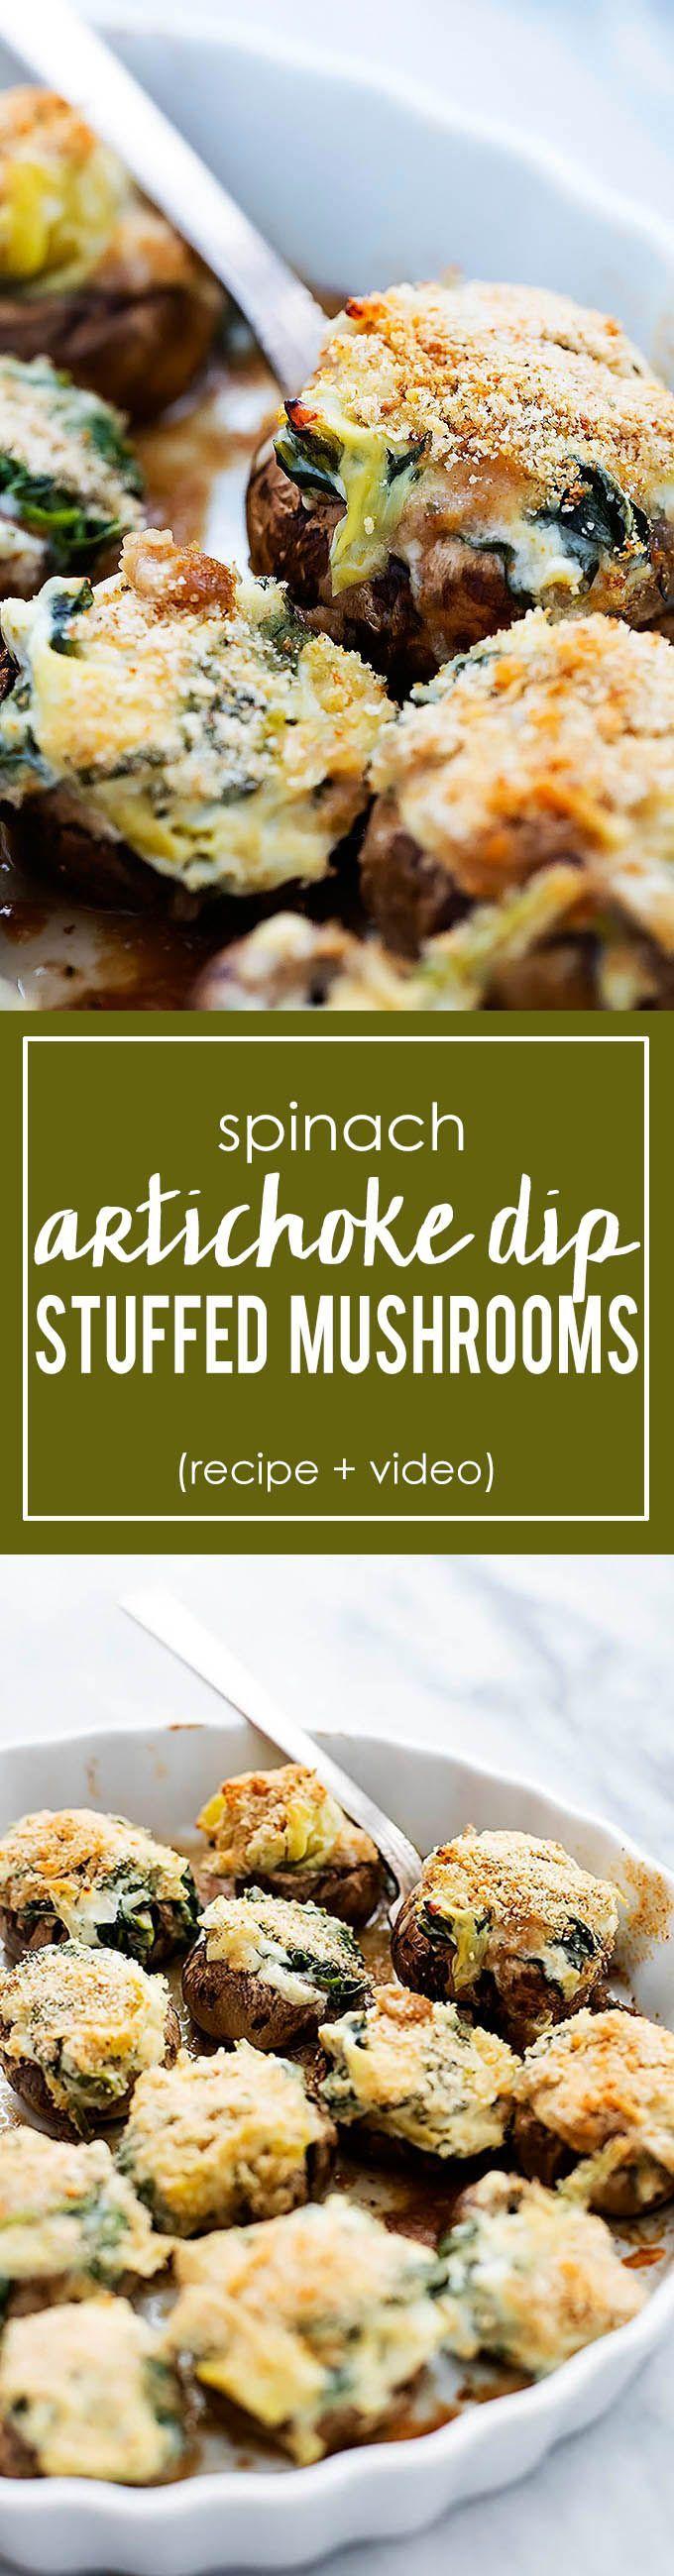 Spinach Artichoke Dip Stuffed Mushrooms   Creme de la Crumb